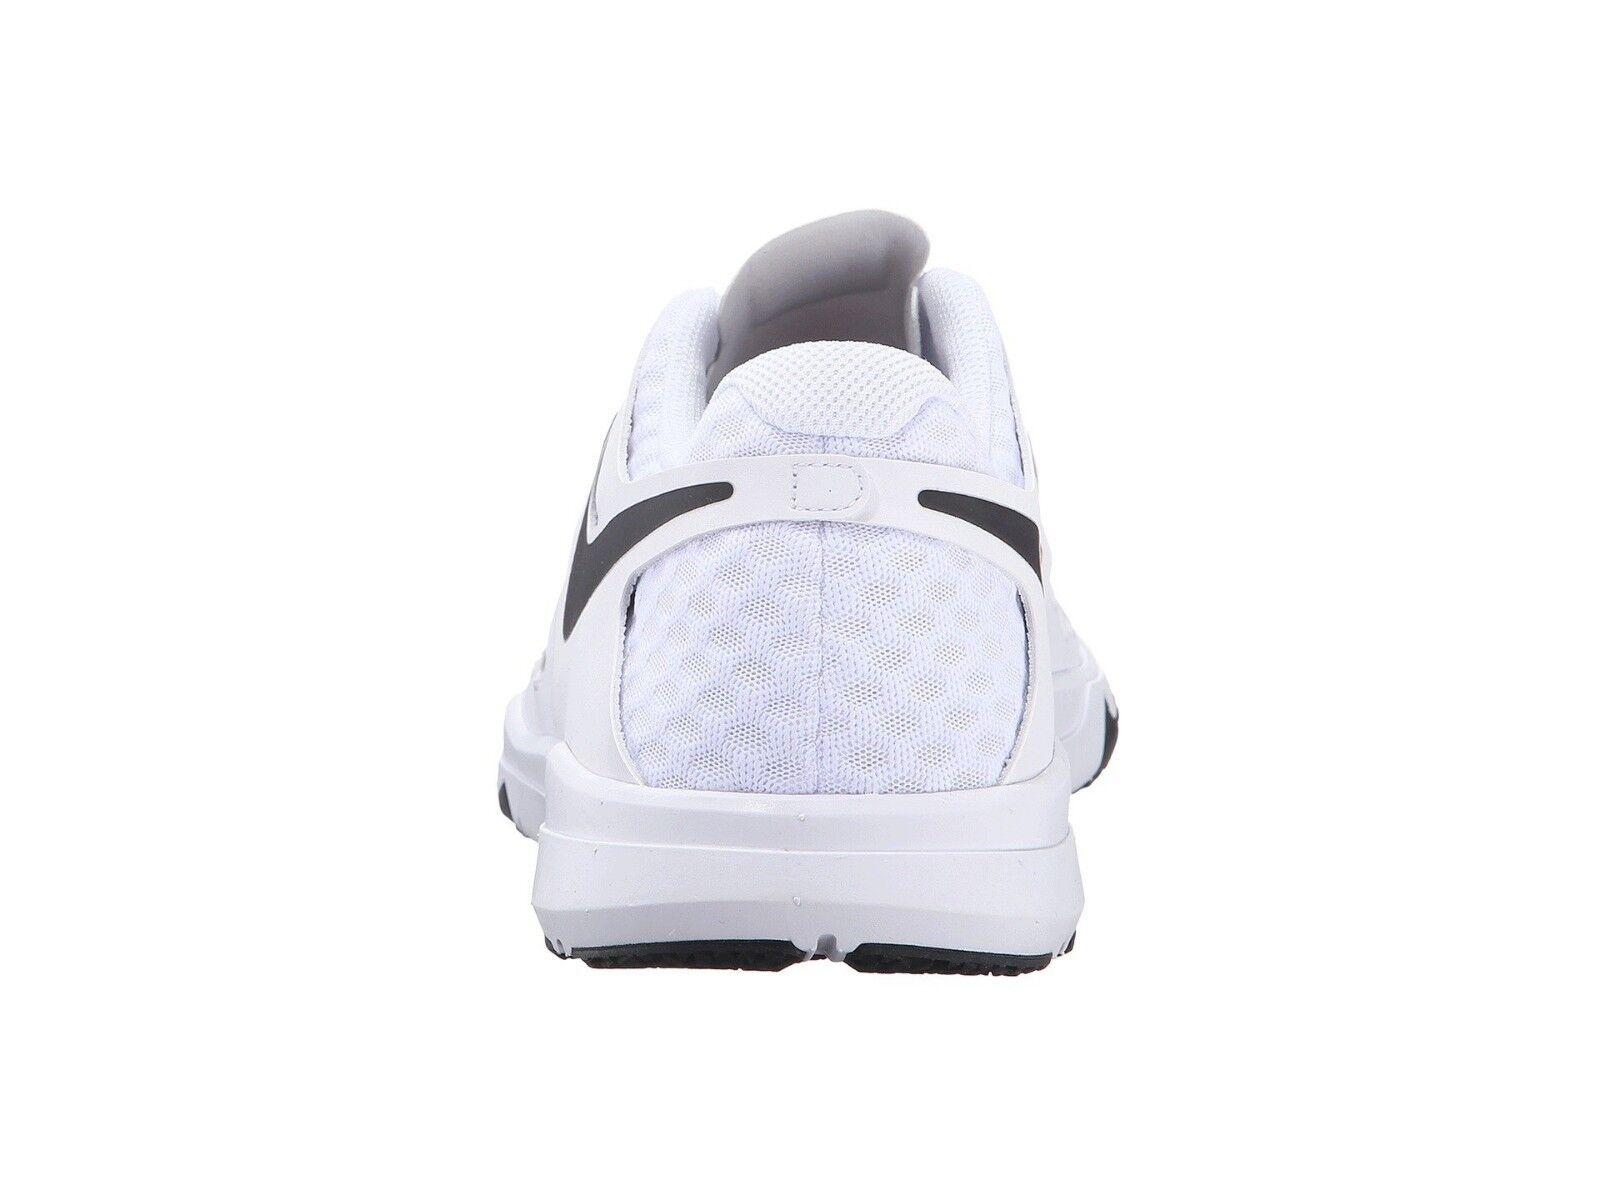 Men's Nike Train Train Train Speed 4 Training Shoes, 843937 103 Sizes 8-15 White/Black ddd48d